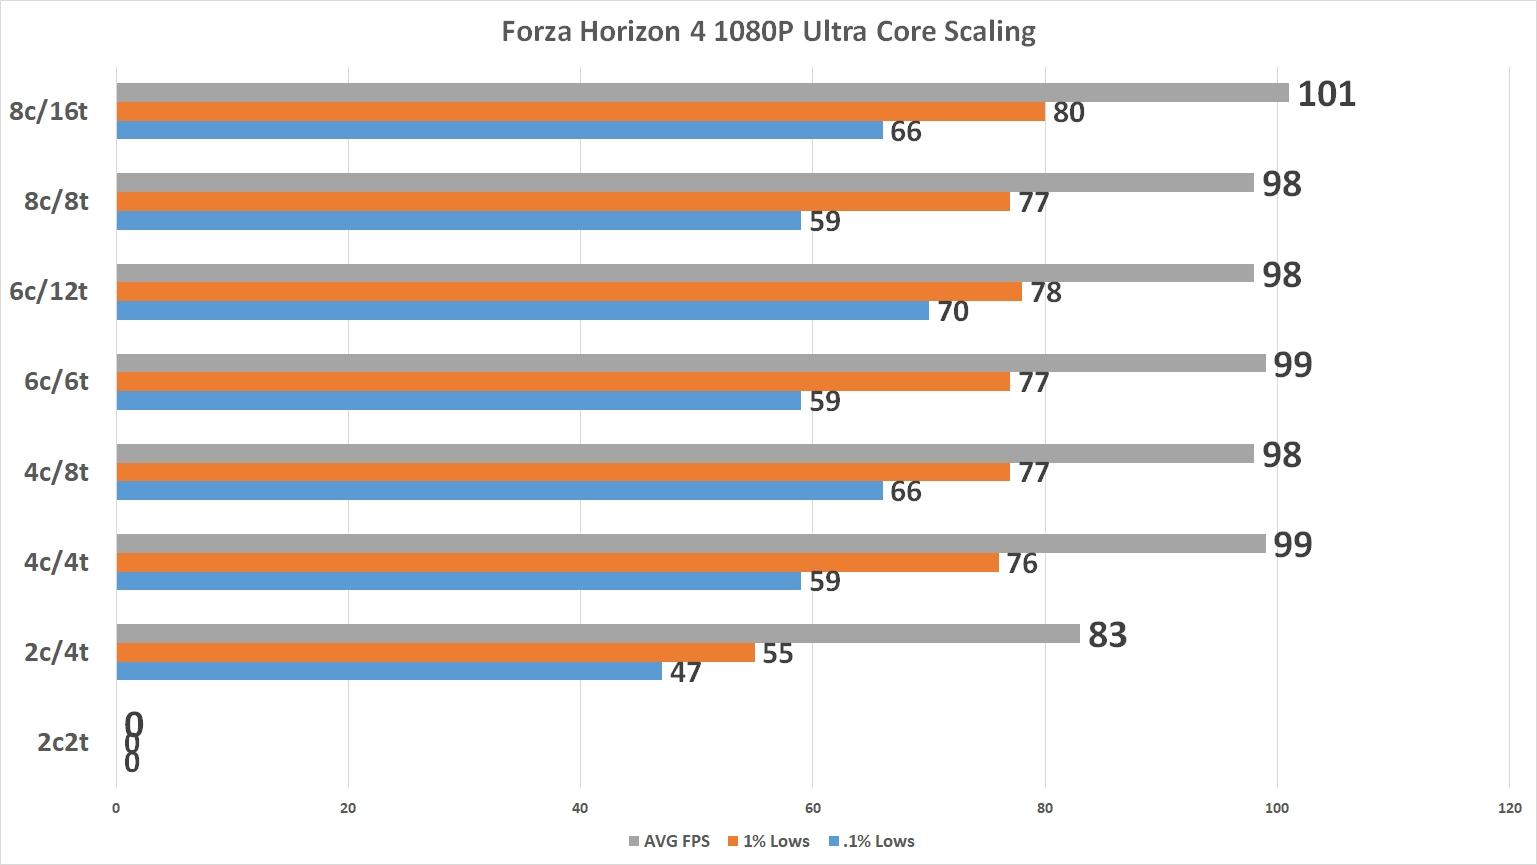 Forza Horizon 4 Demo GPU Performance and Ryzen Core Scaling